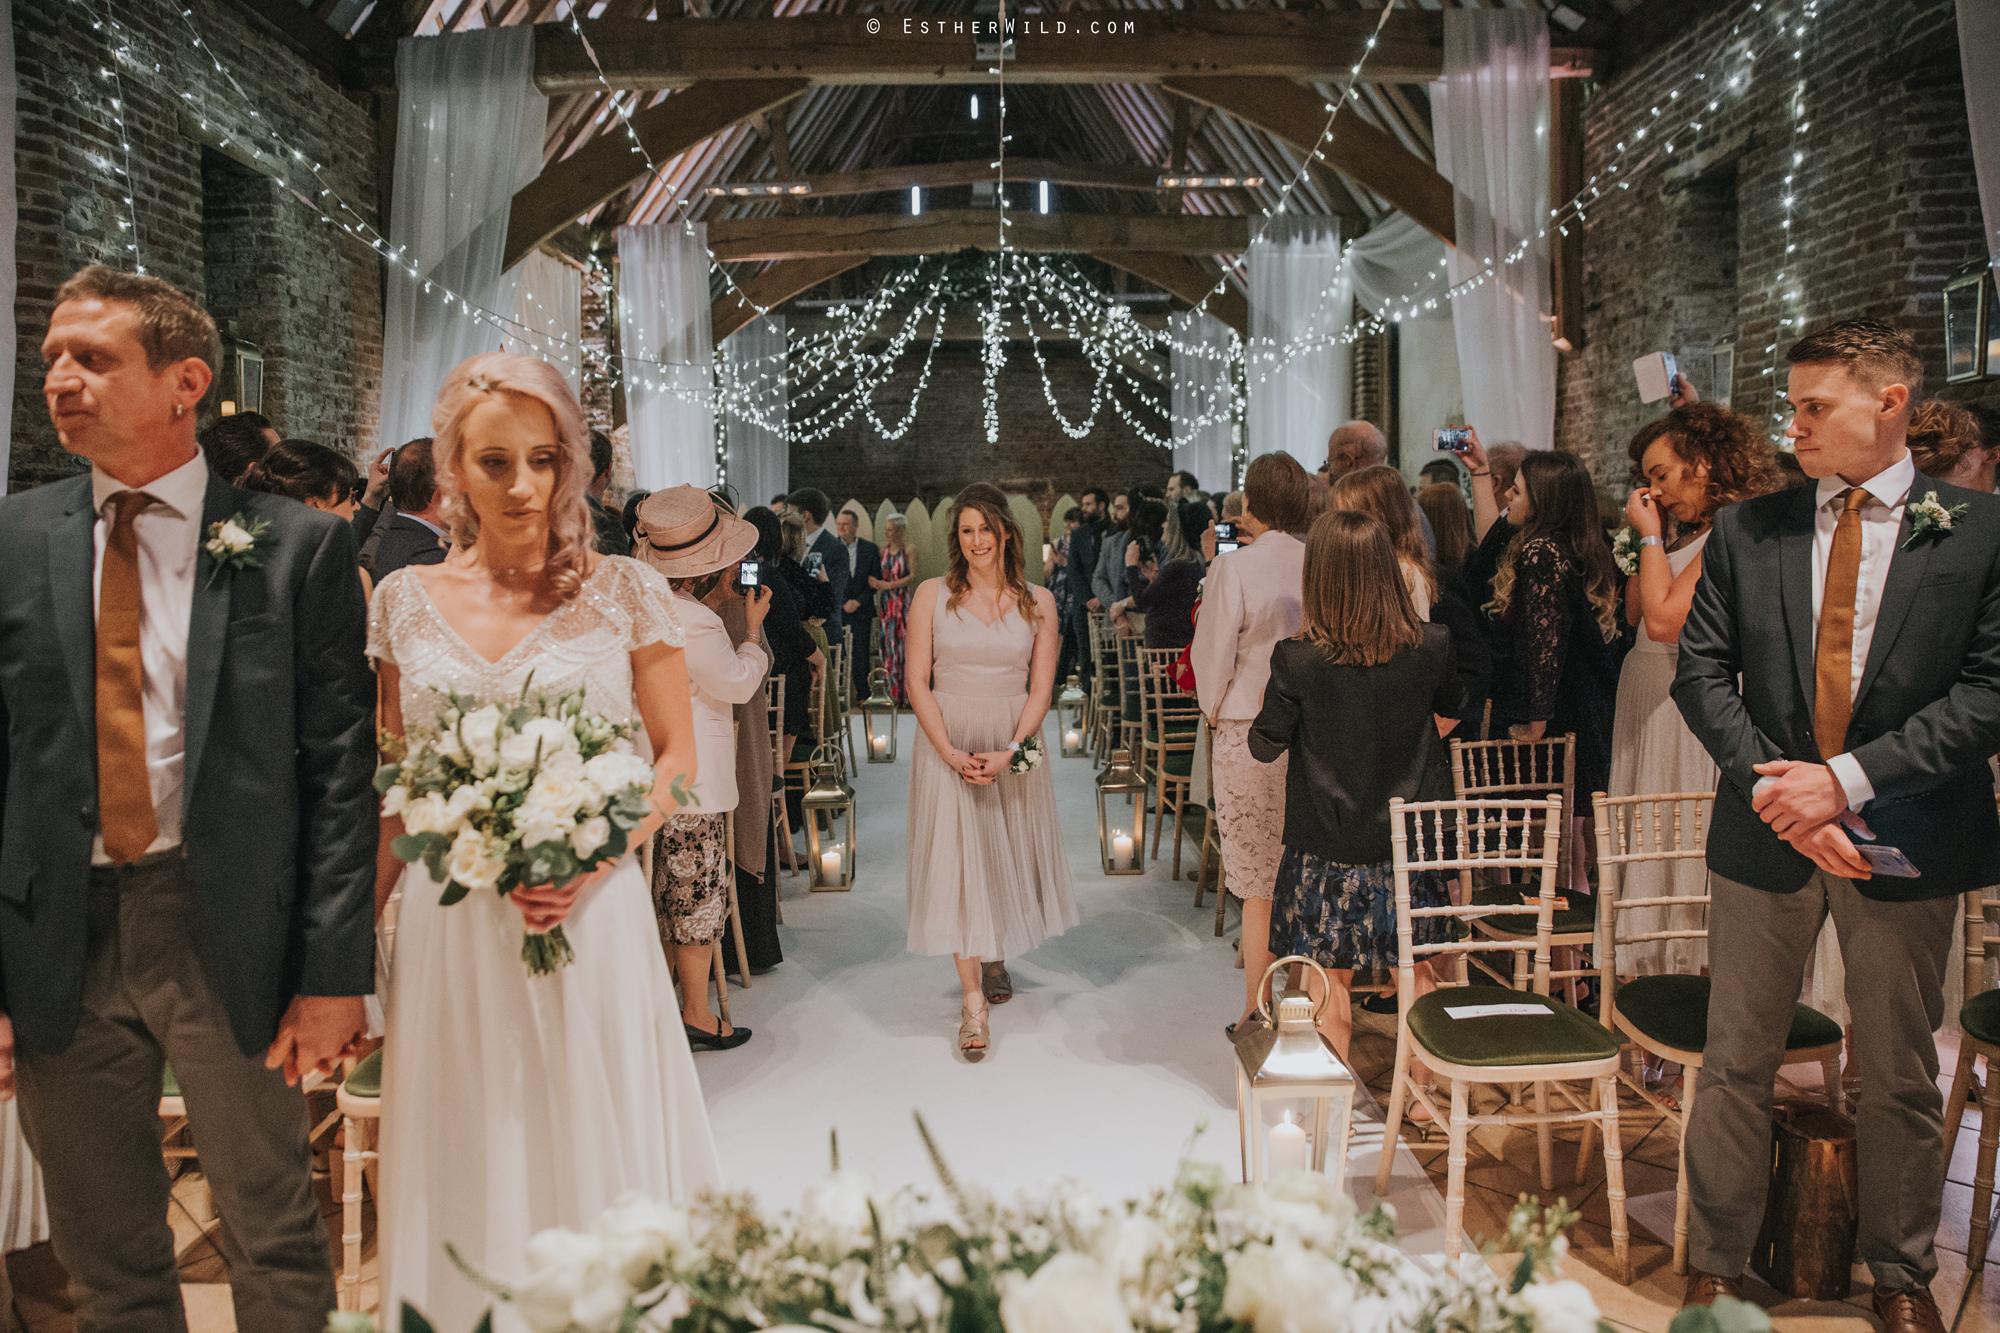 Elms_Barn_Weddings_Suffolk_Photographer_Copyright_Esther_Wild_IMG_1103.jpg